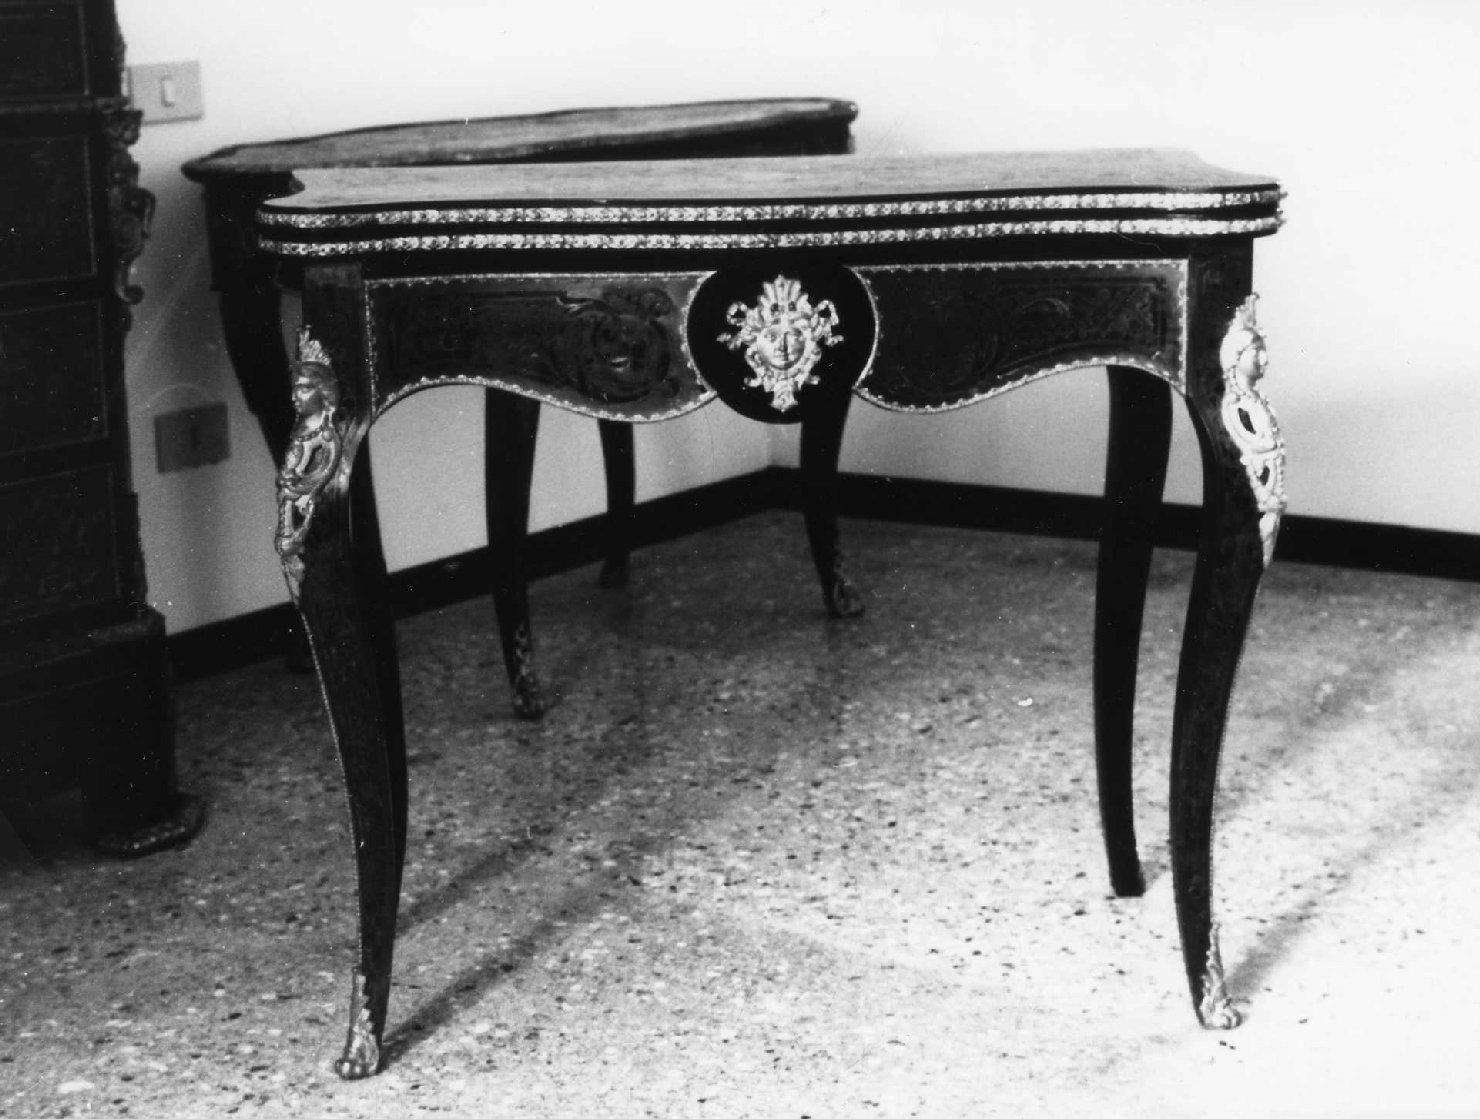 cassettone, serie - manifattura francese, manifattura francese (metà, metà sec. XIX, sec. XIX)